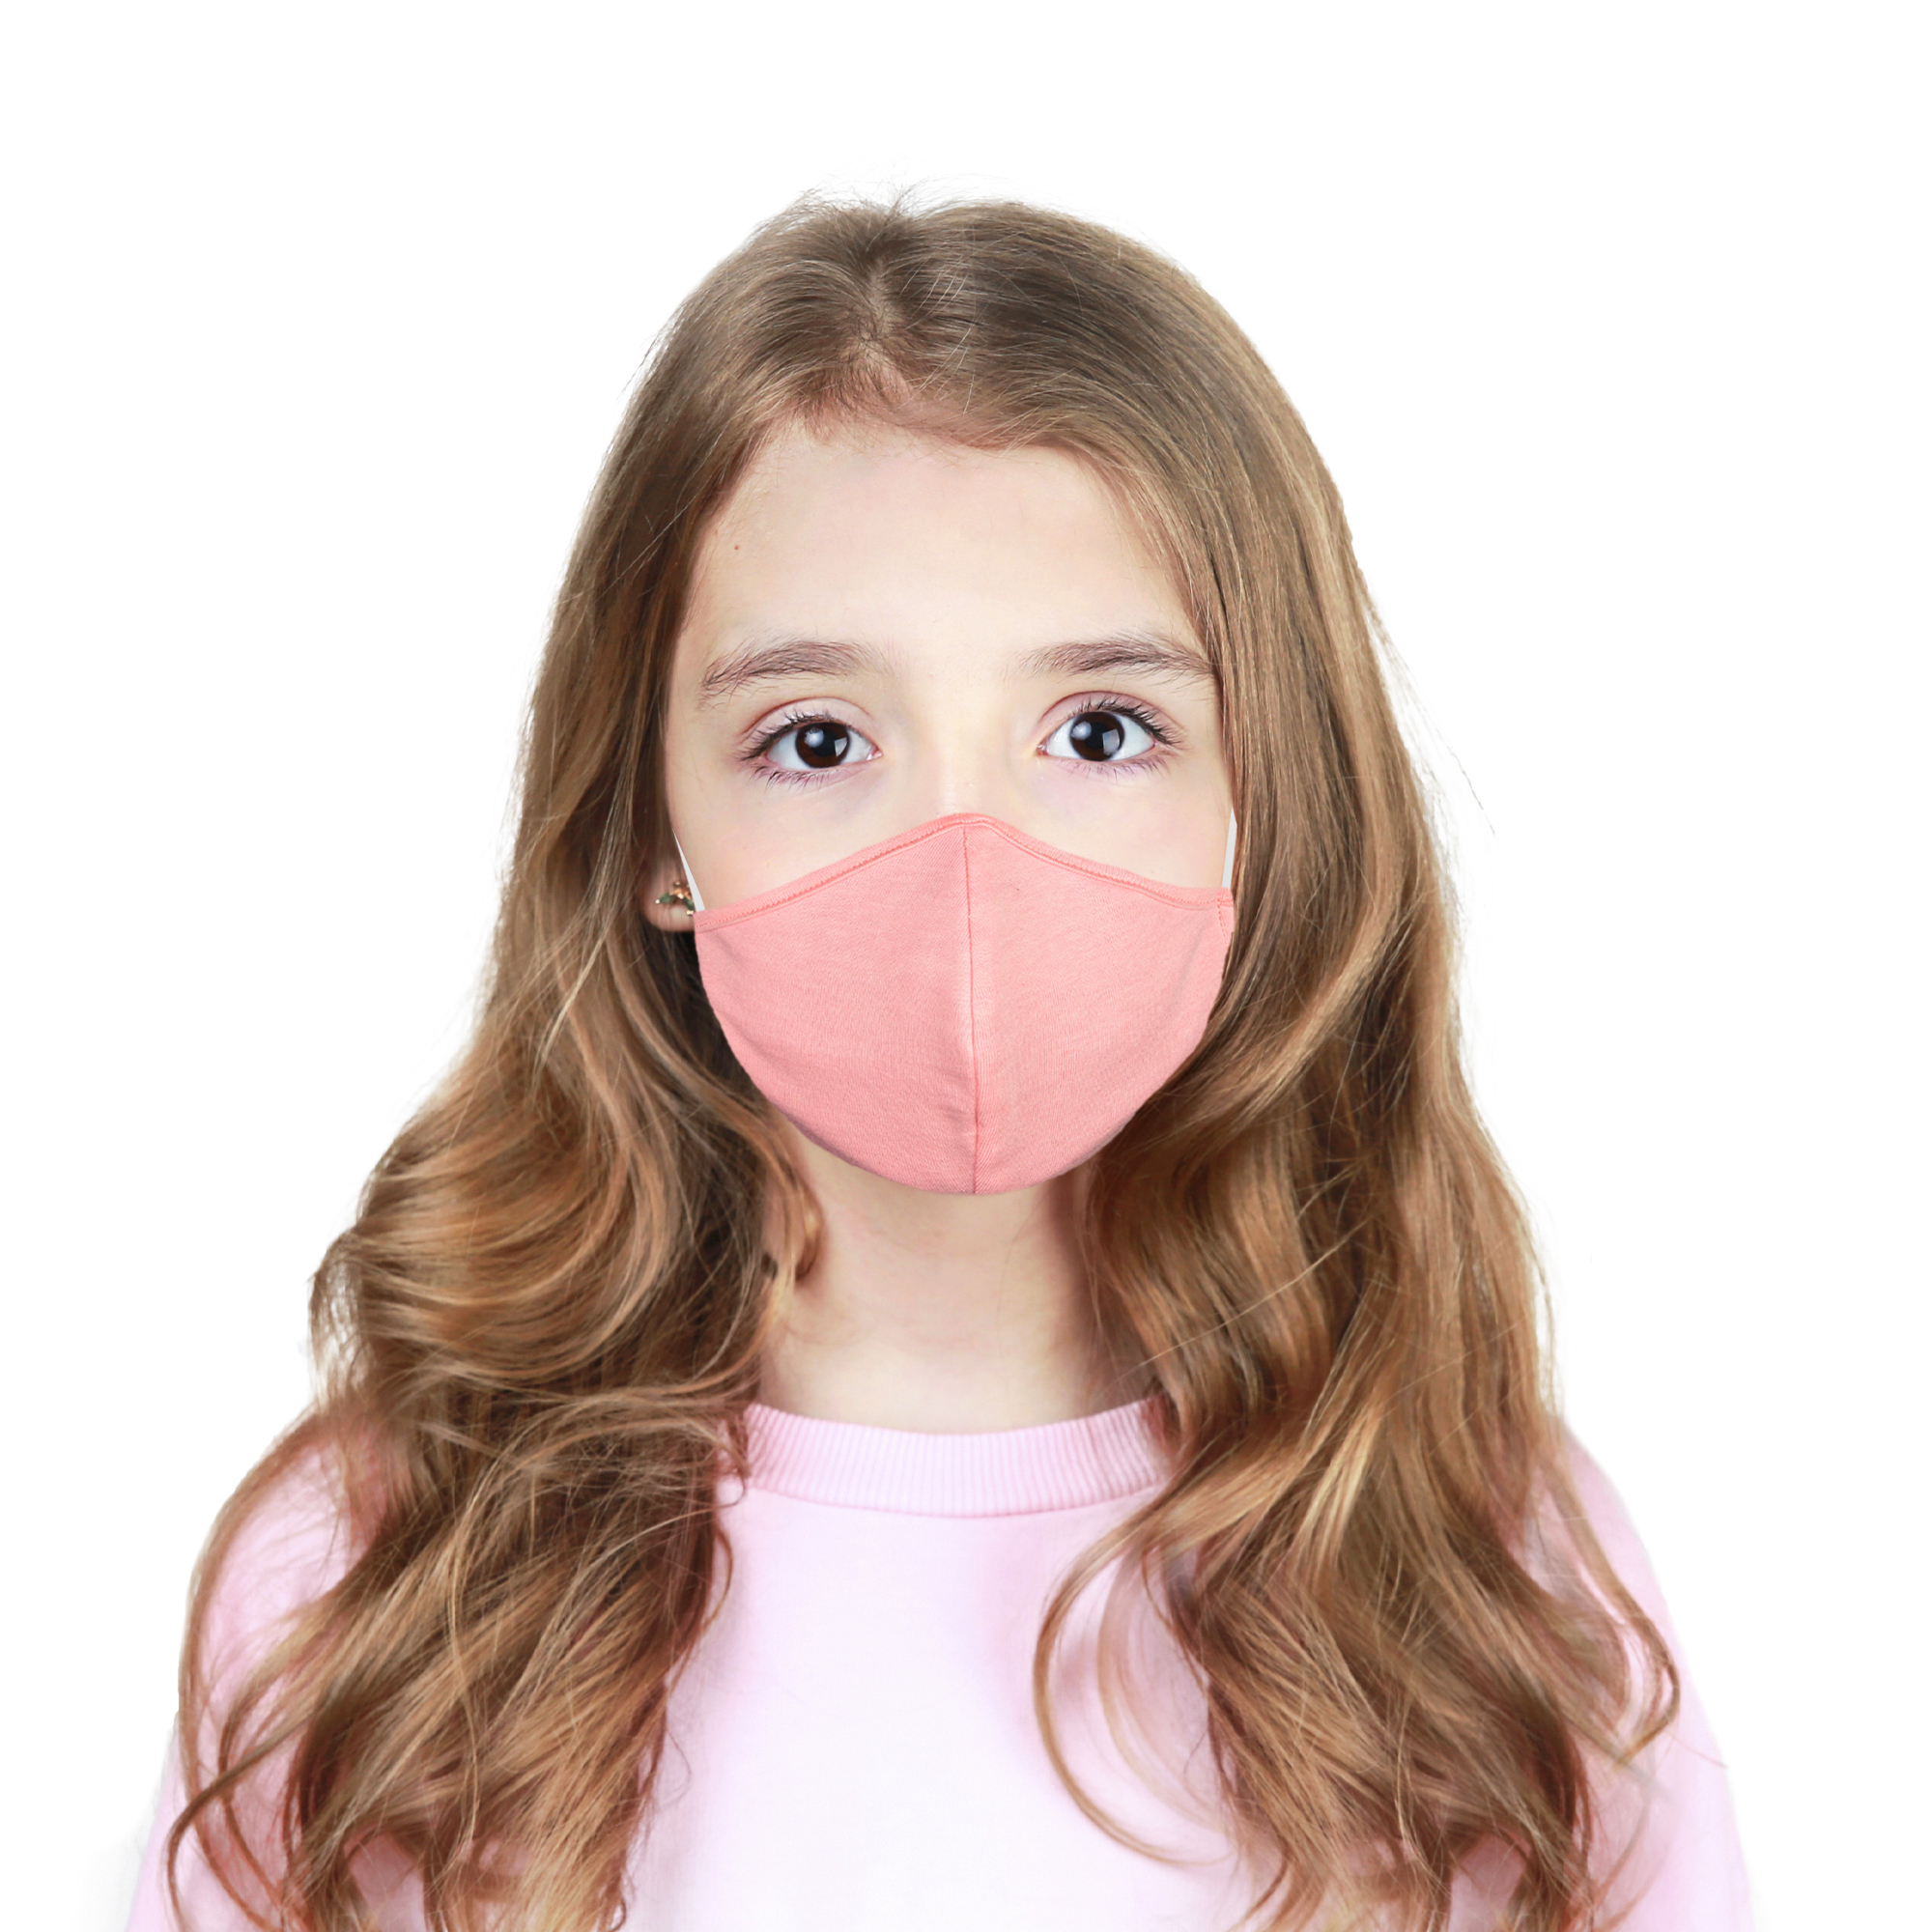 Dalix Dalix Kids Cotton Face Mask Reuseable Washable In Lavender Made In Usa Xxs Xs Size Walmart Com Walmart Com